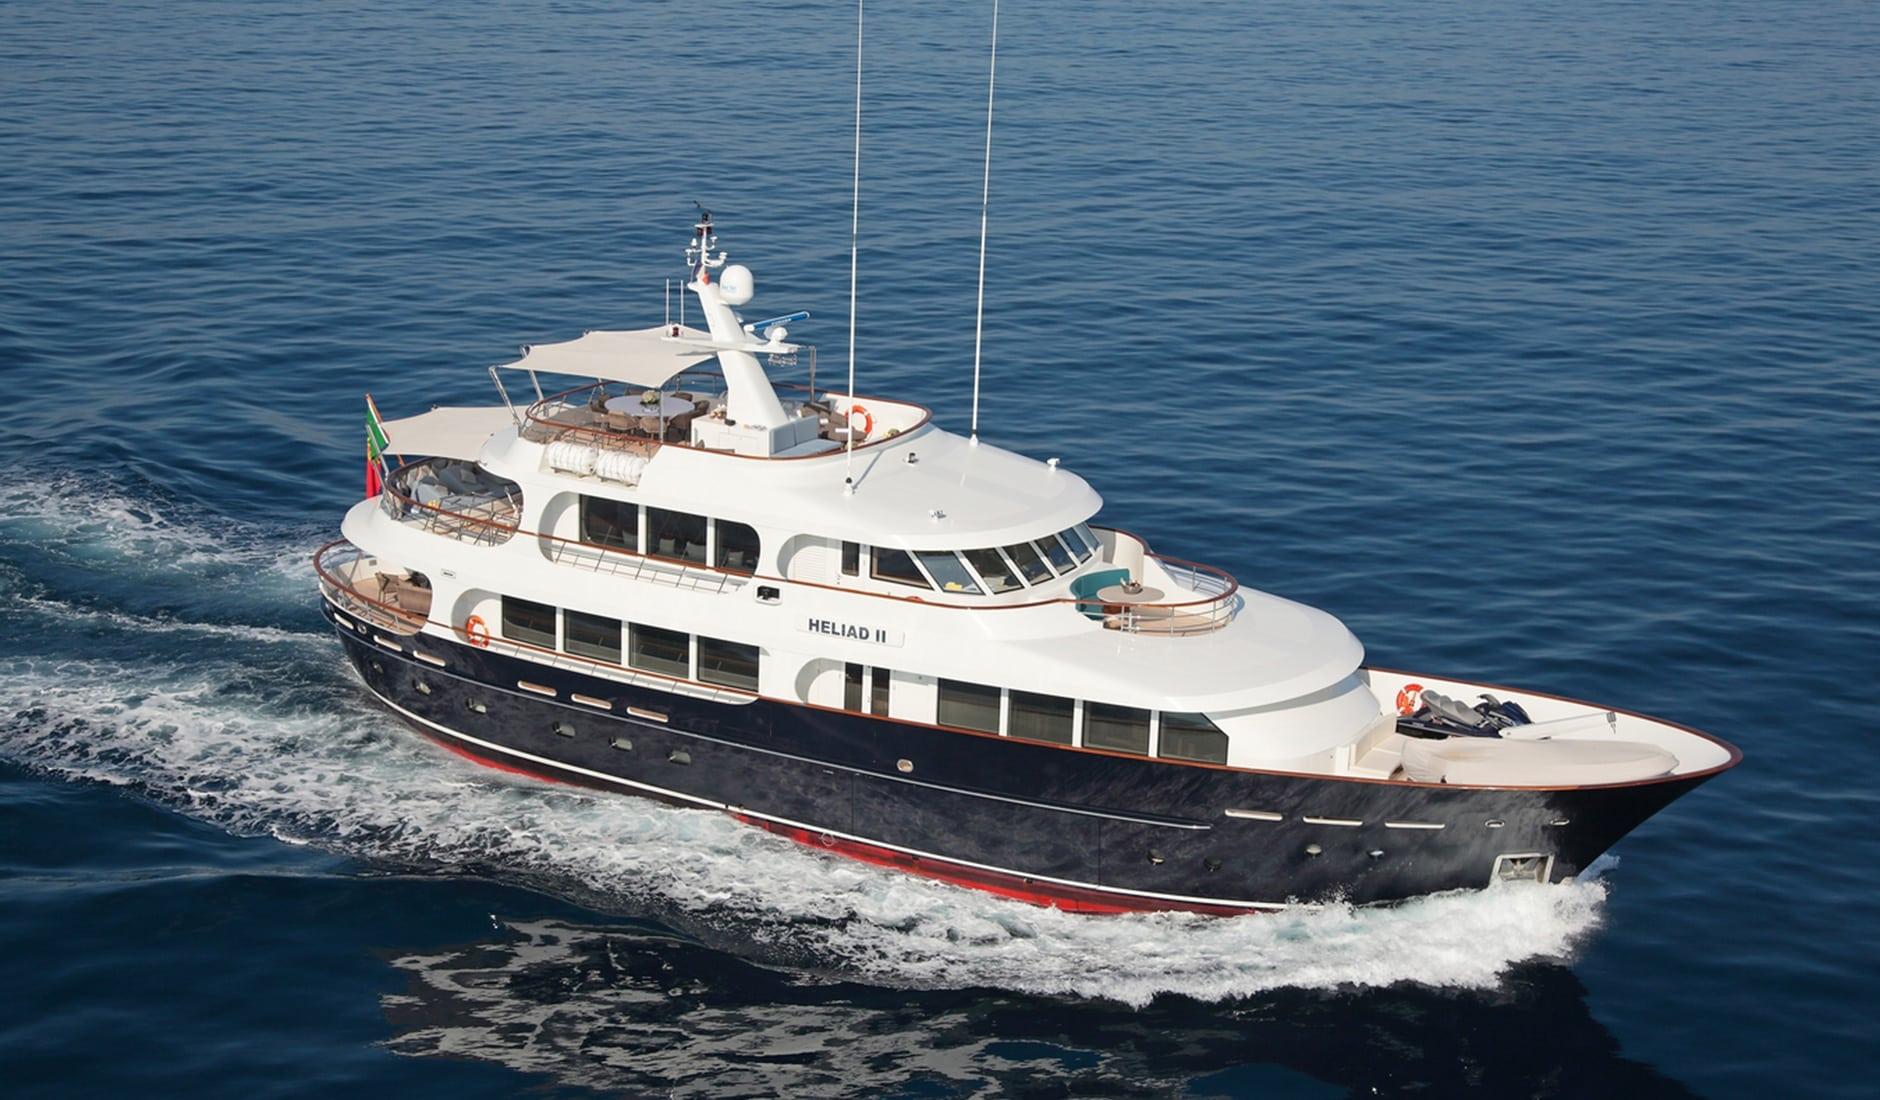 Аренда яхты LYNX YACHTS Heliad II/2013